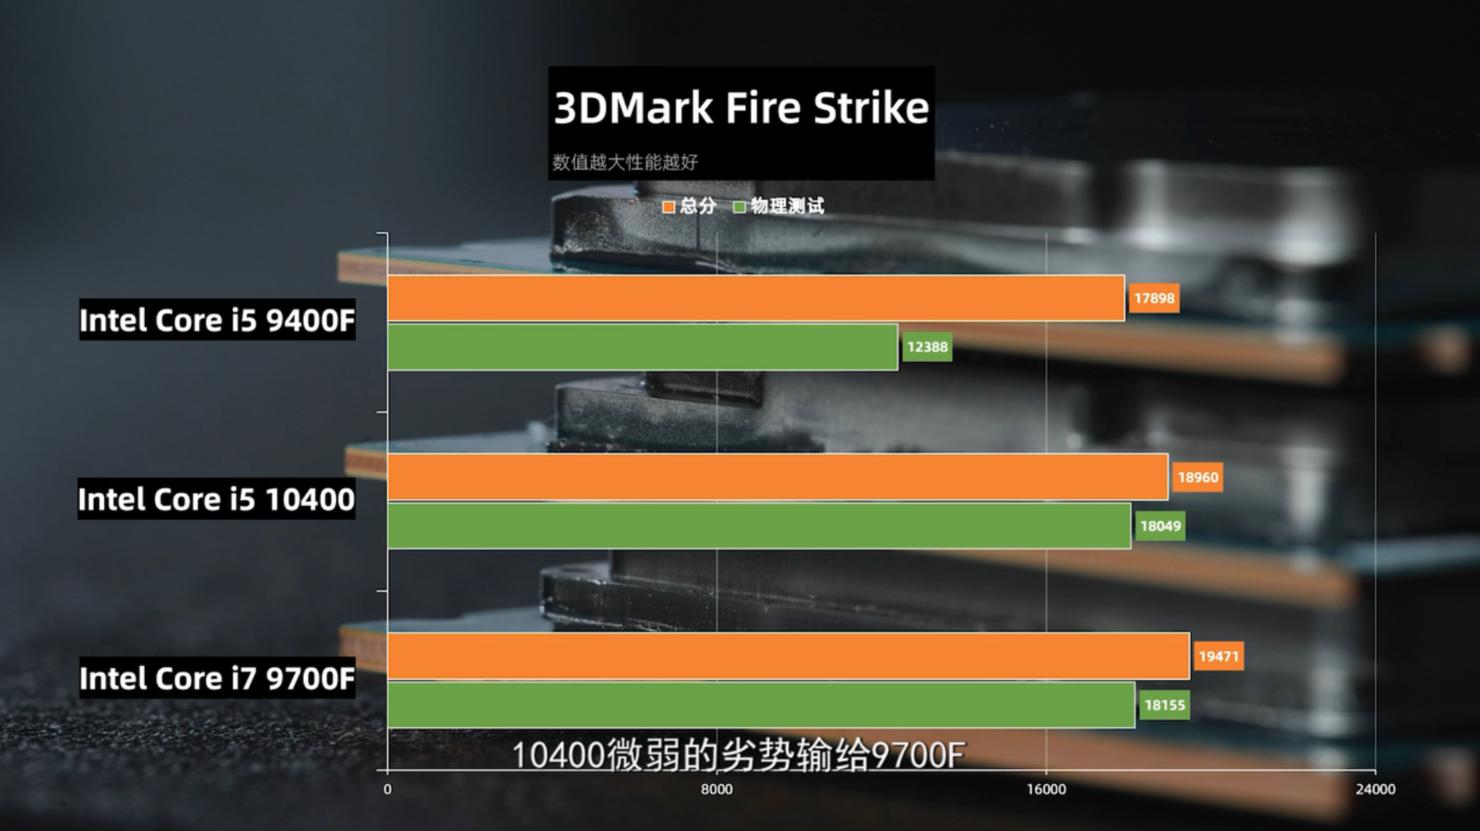 intel-core-i5-10400-comet-lake-s-6-core-desktop-cpu_3dmark-firestrike